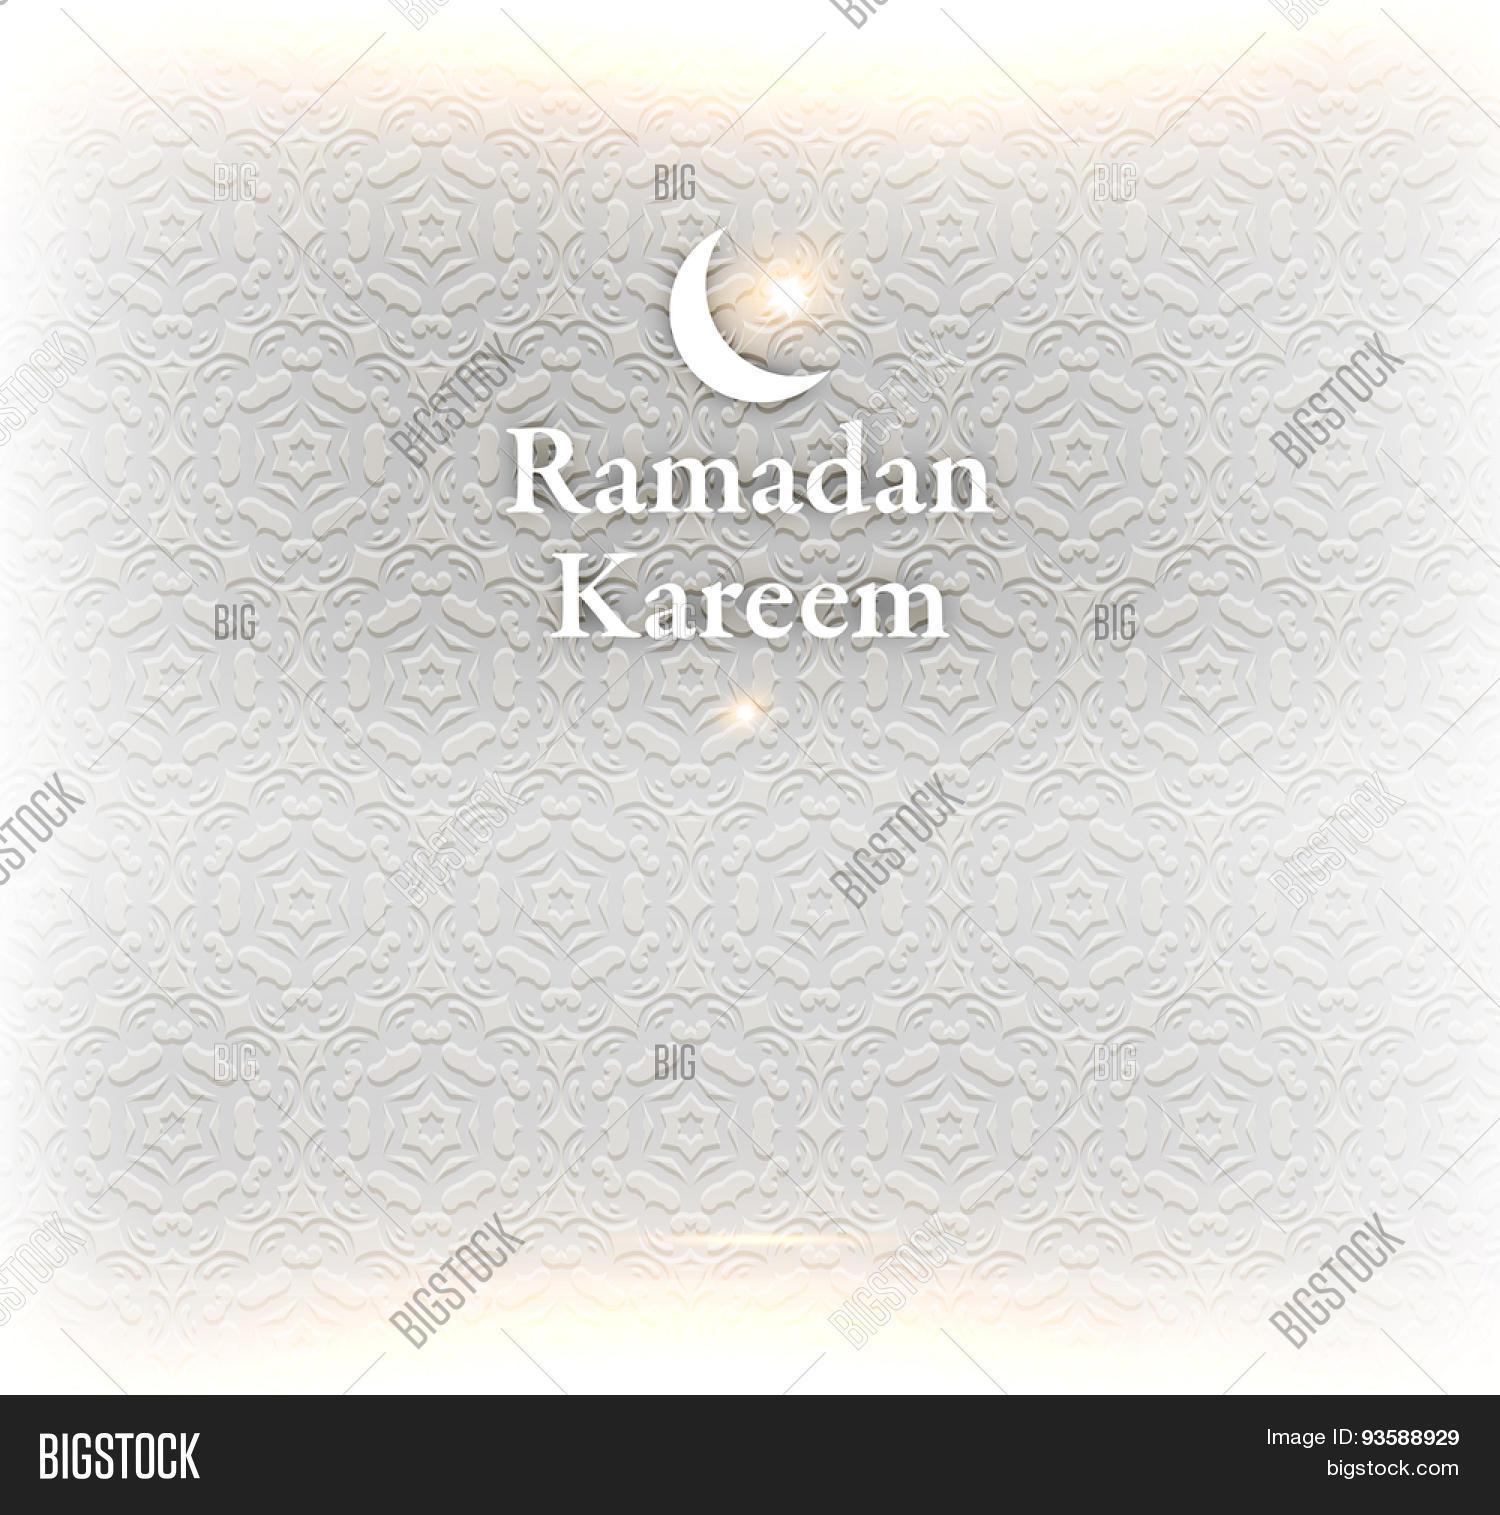 Ramadan Kareem Vector Photo Free Trial Bigstock